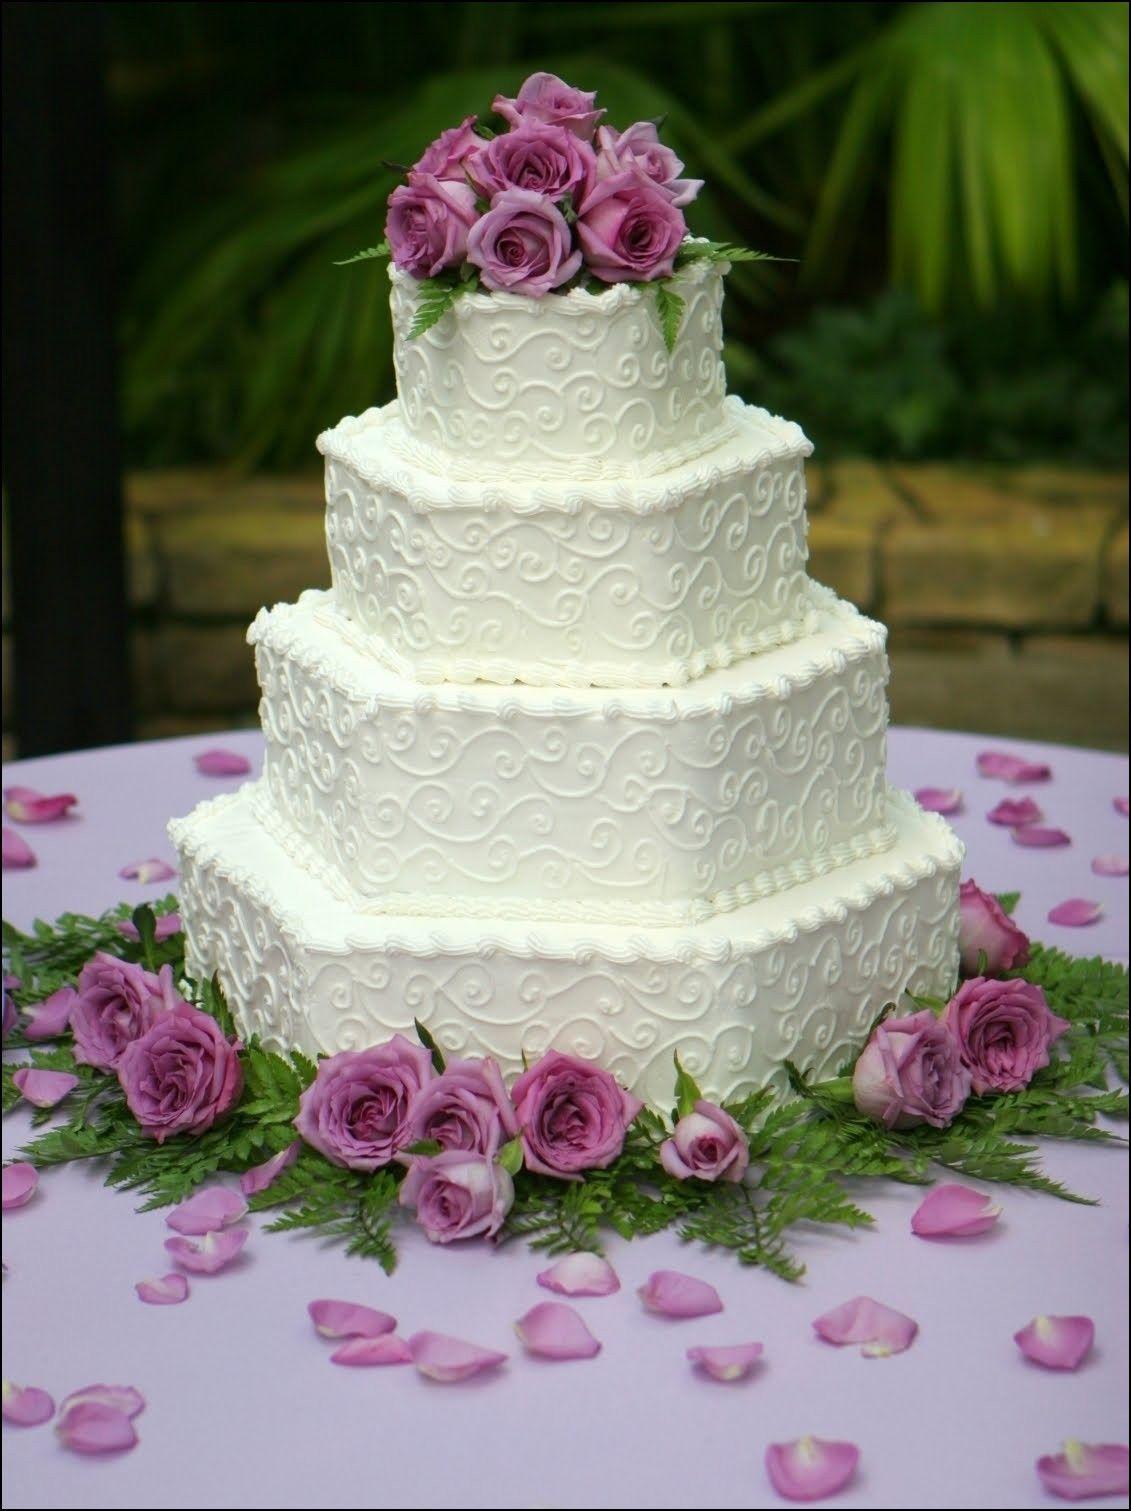 Costco Wedding Cakes Designs  Wedding cake purple flowers, Costco